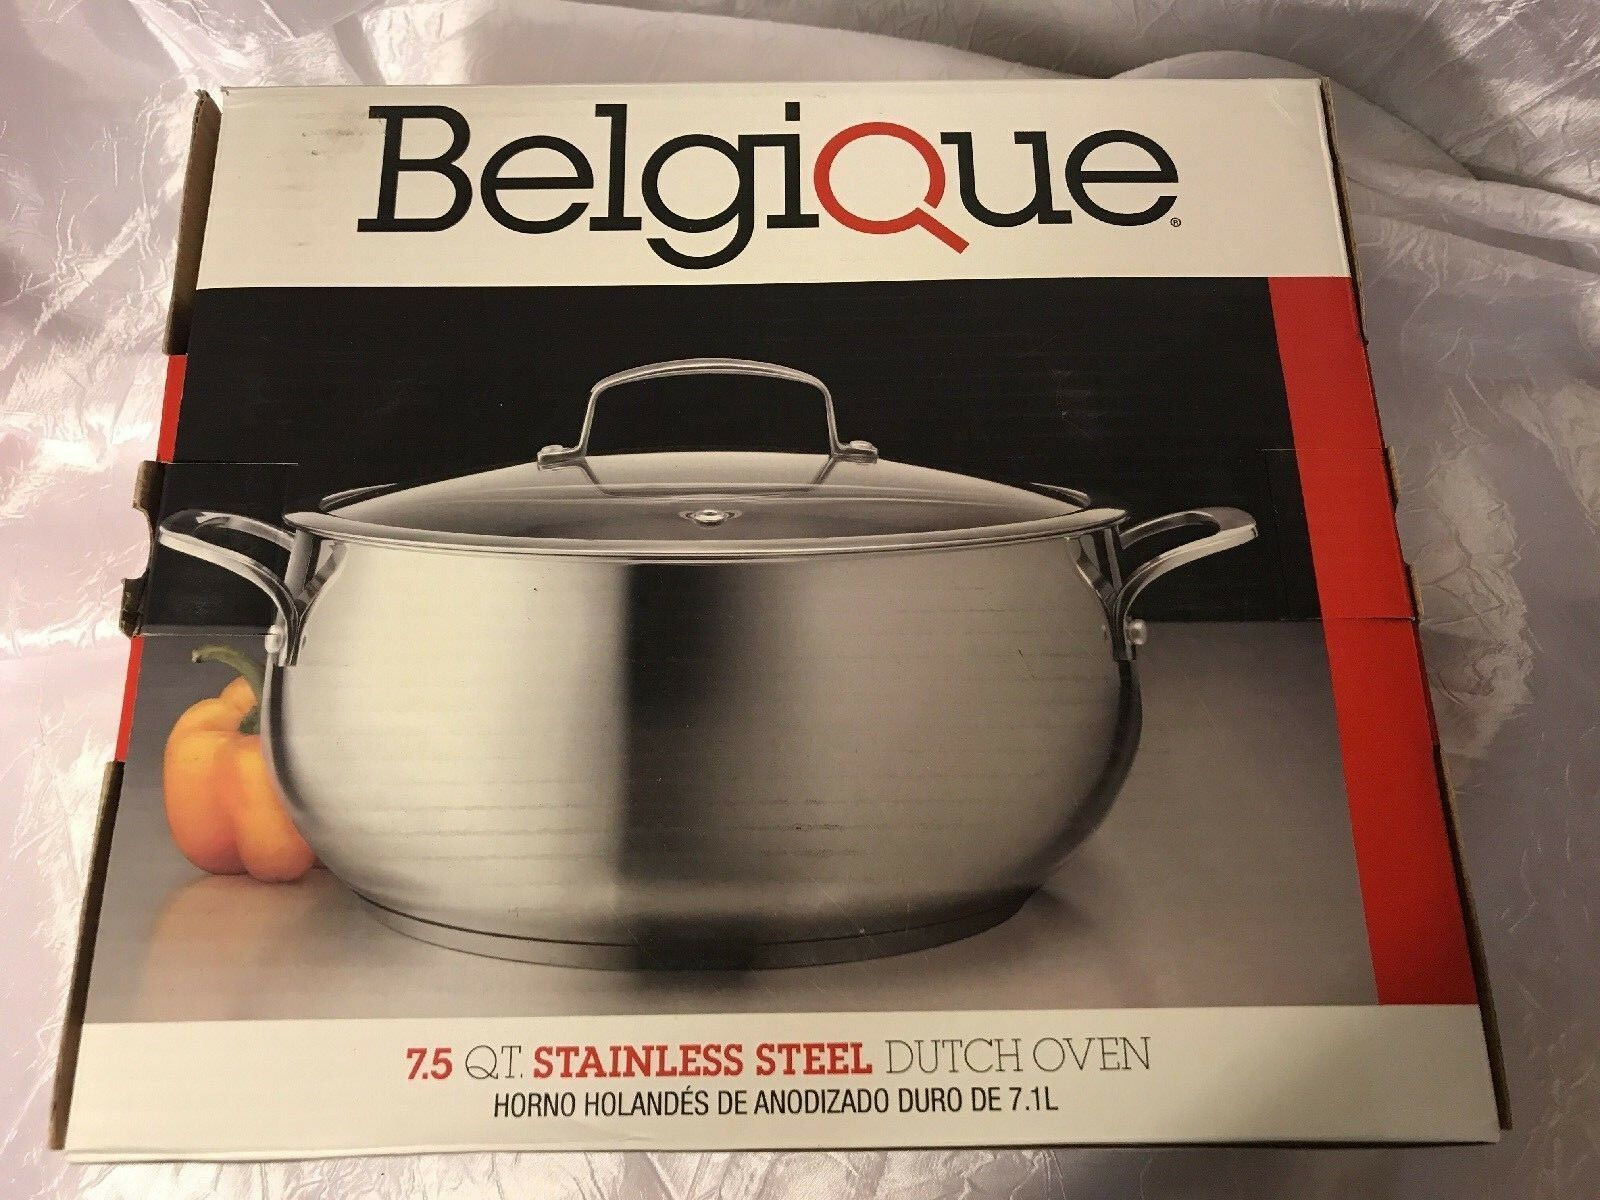 Belgique 7.5 QT Stainless Steel Dutch Oven